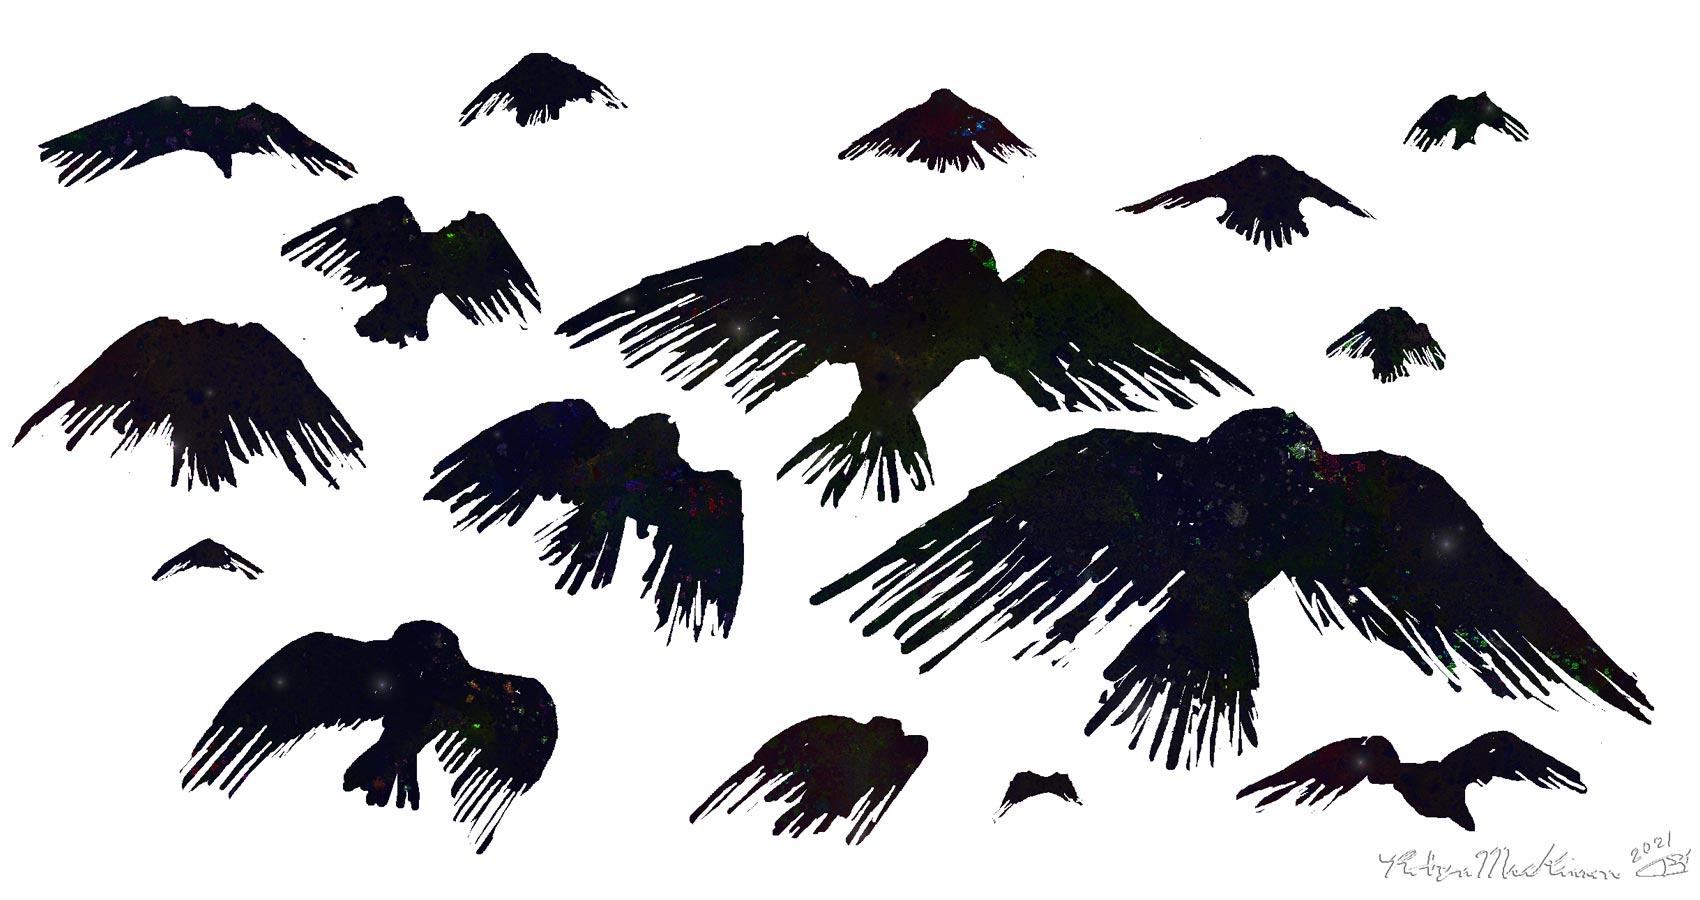 Crow Army, a haiku by Robyn MacKinnon at Spillwords.com